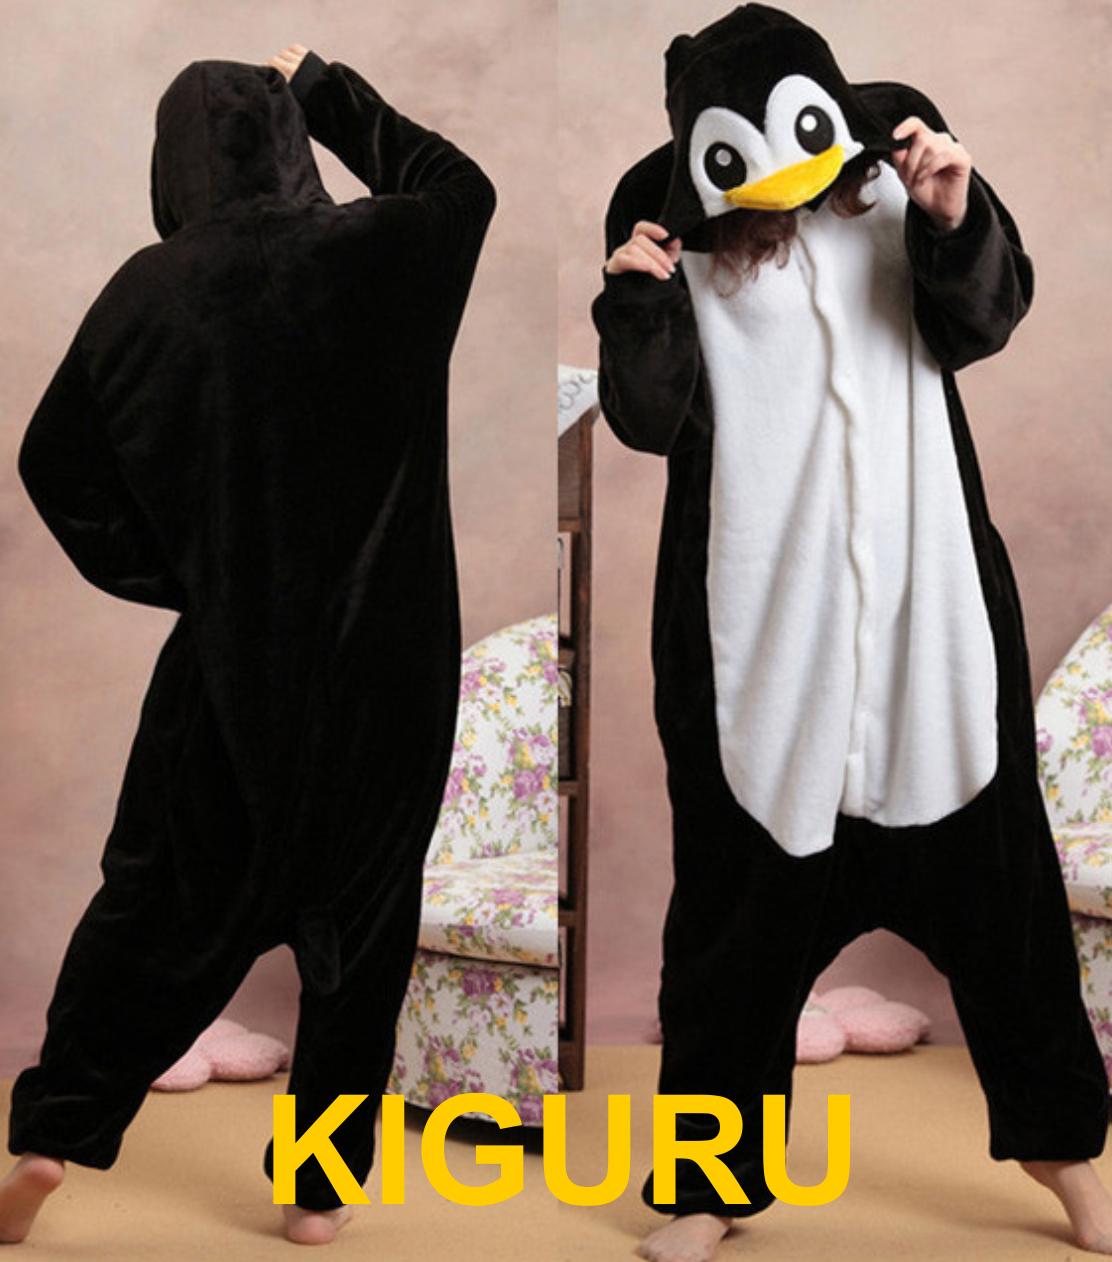 Костюм кигуруми пижама пингвин - KIGURU в Киеве 97c5102051370